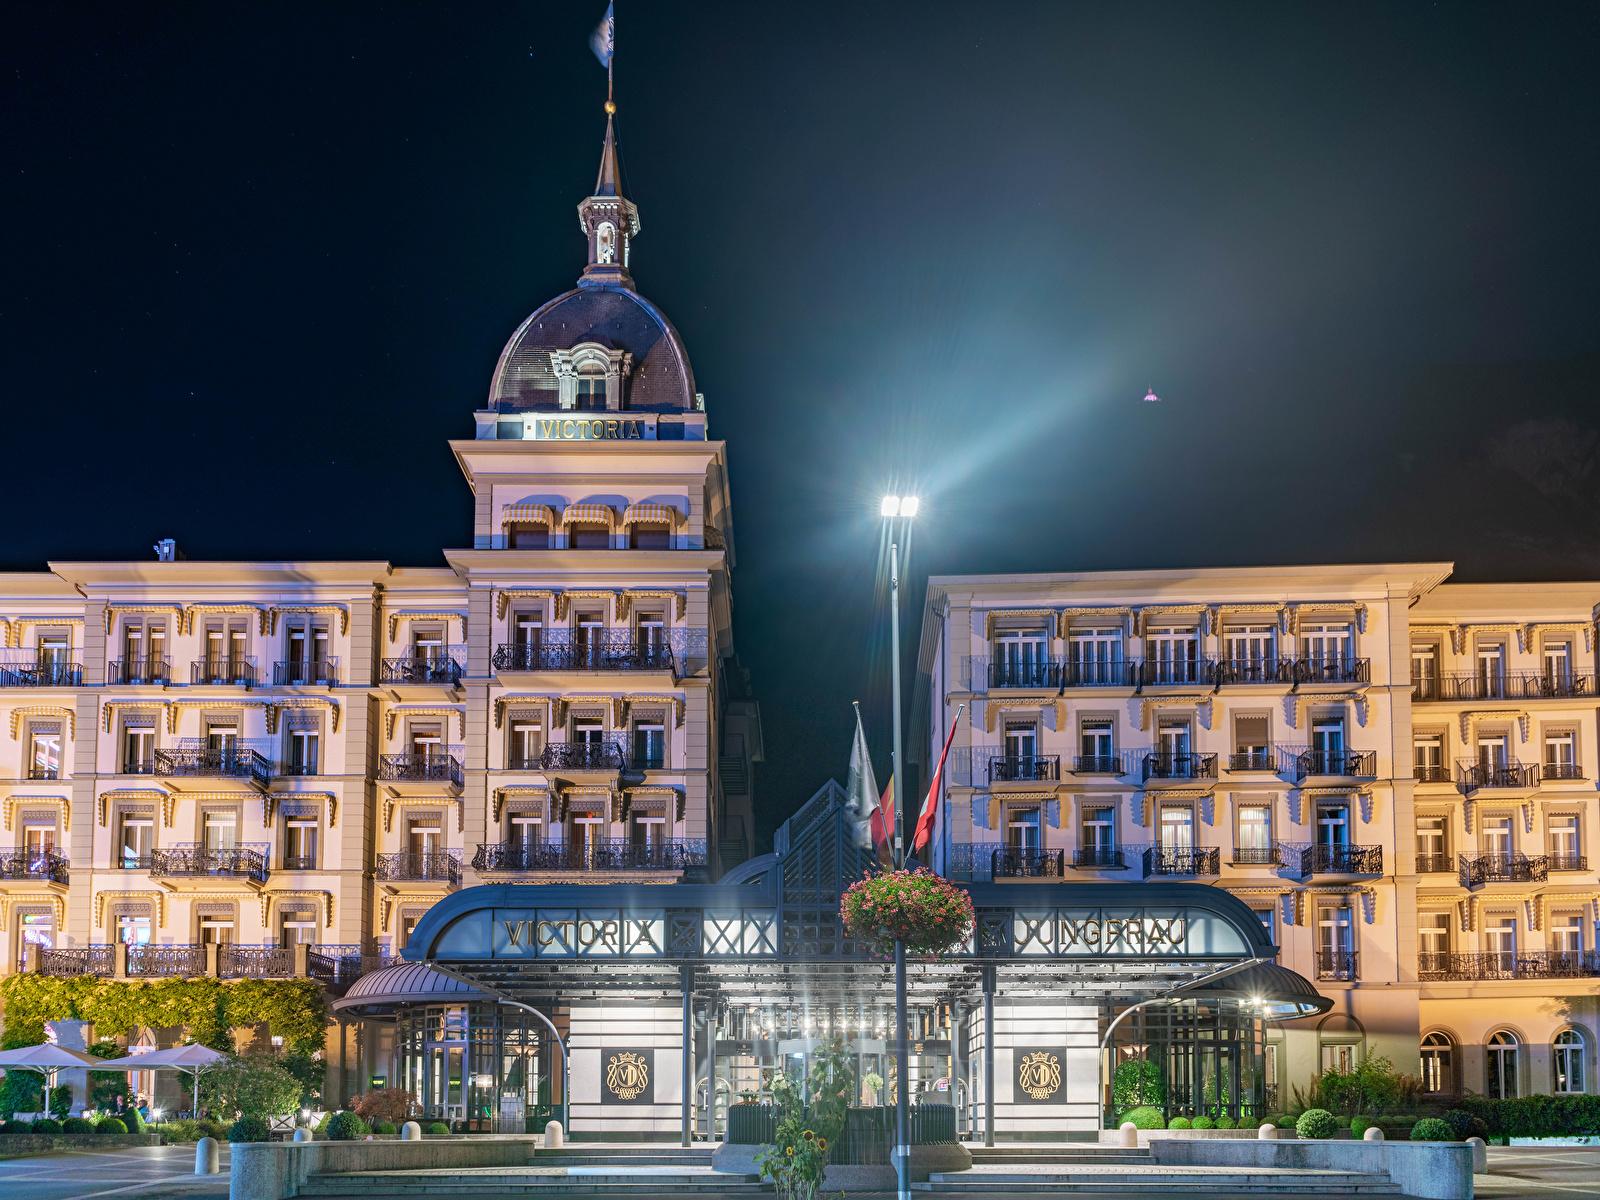 Images Switzerland Interlaken, Bern Hotel night time Street lights Houses Cities 1600x1200 Night Building